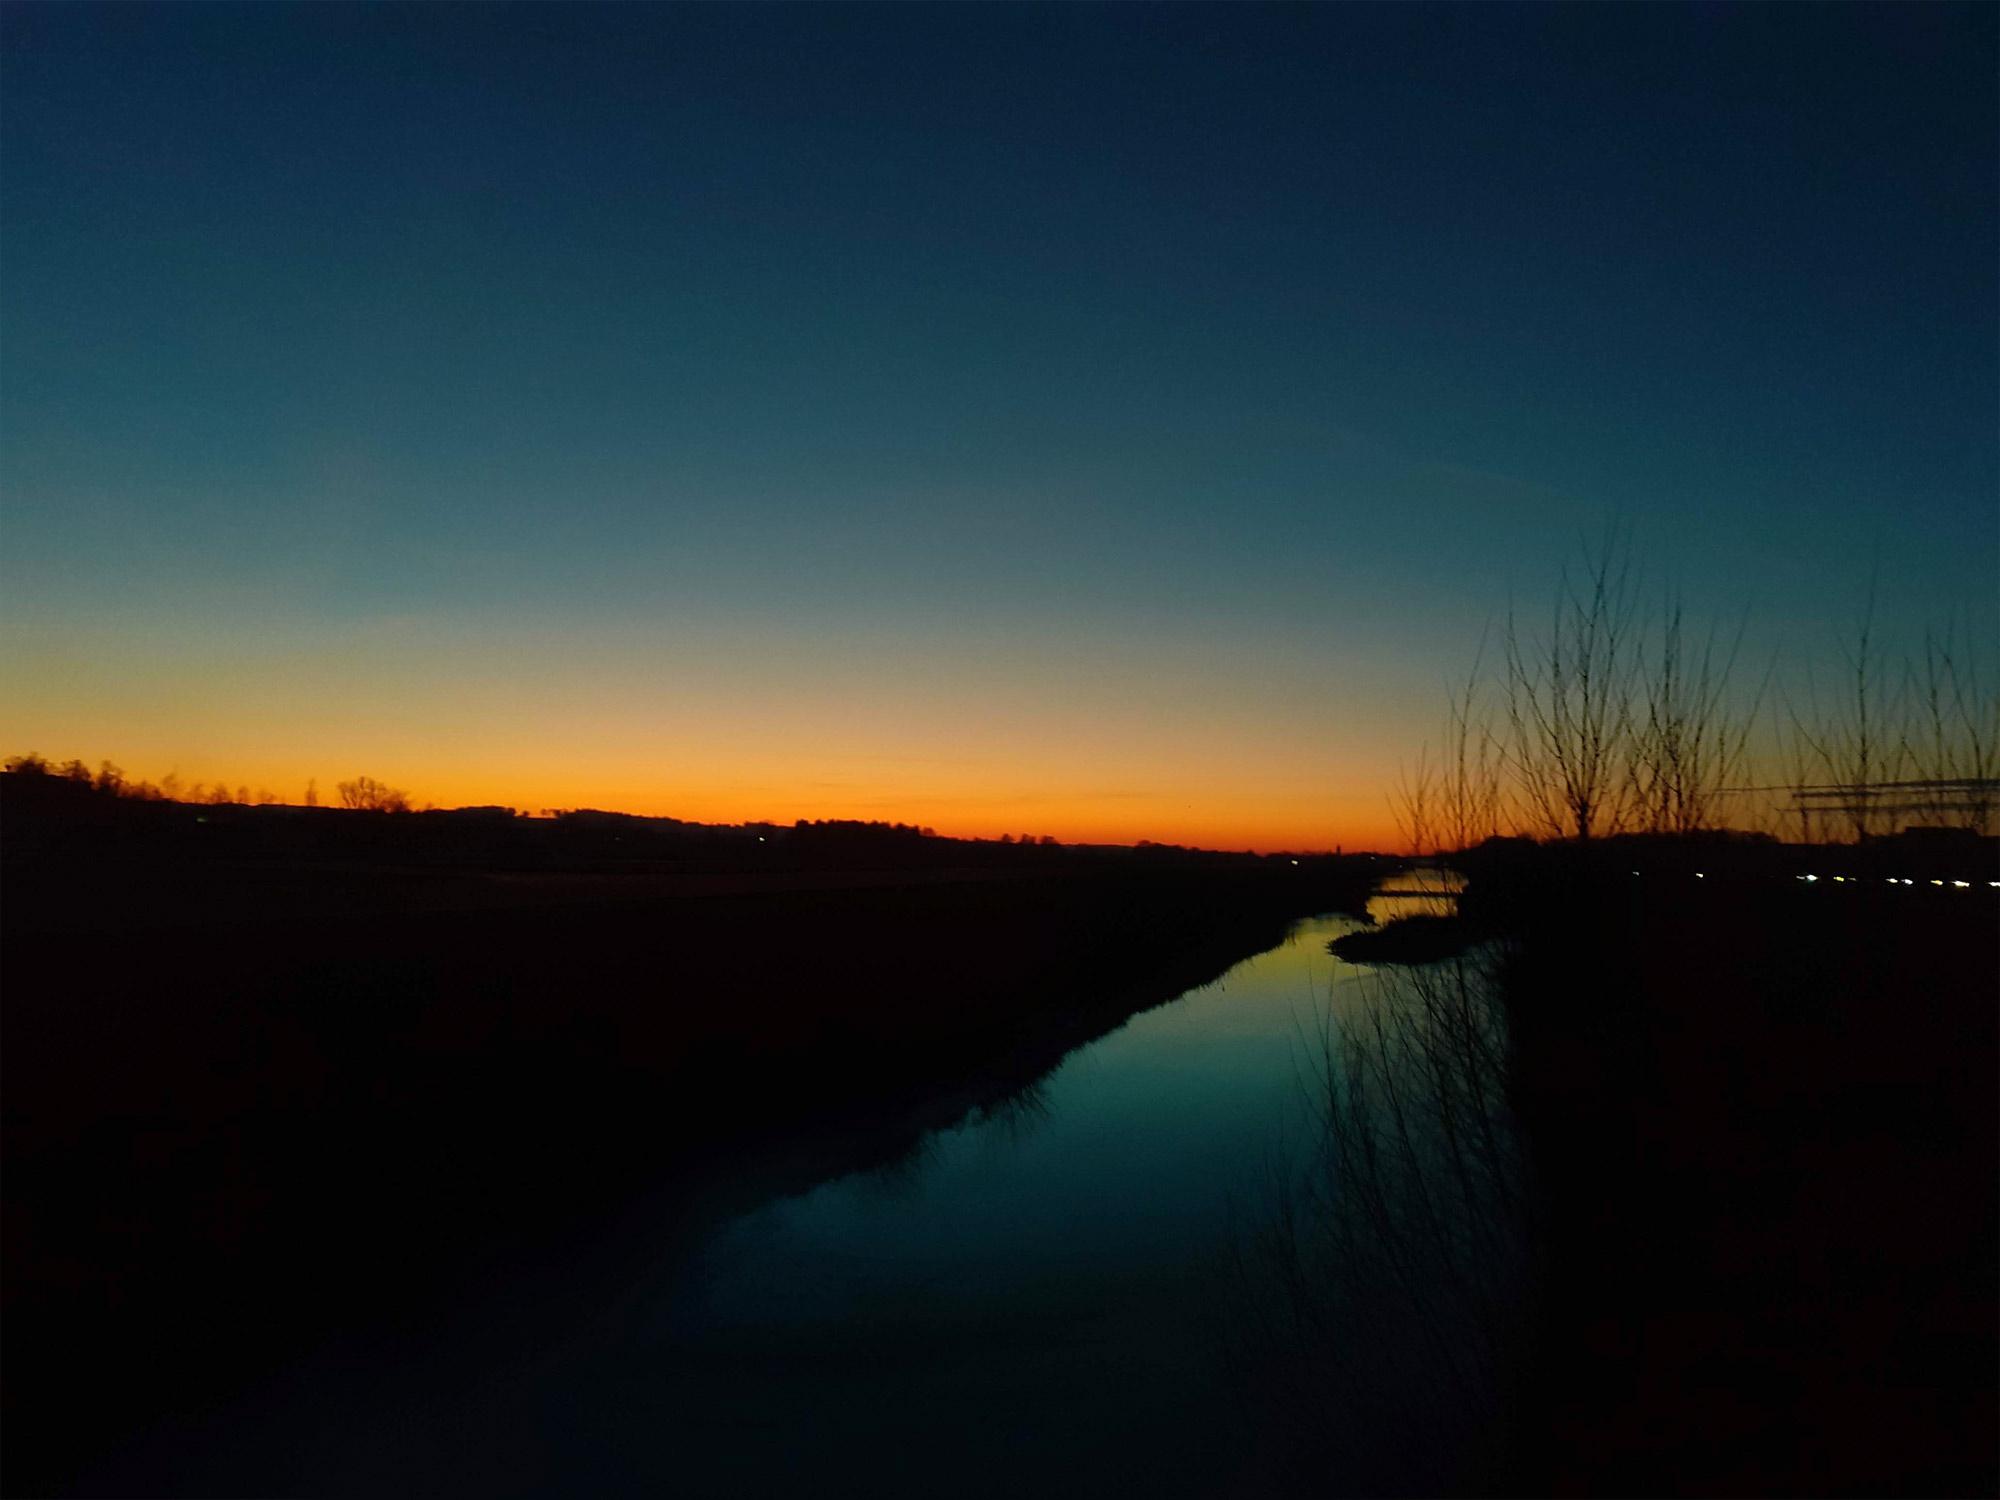 Sonnenuntergang Eggenfelden Flugplatz